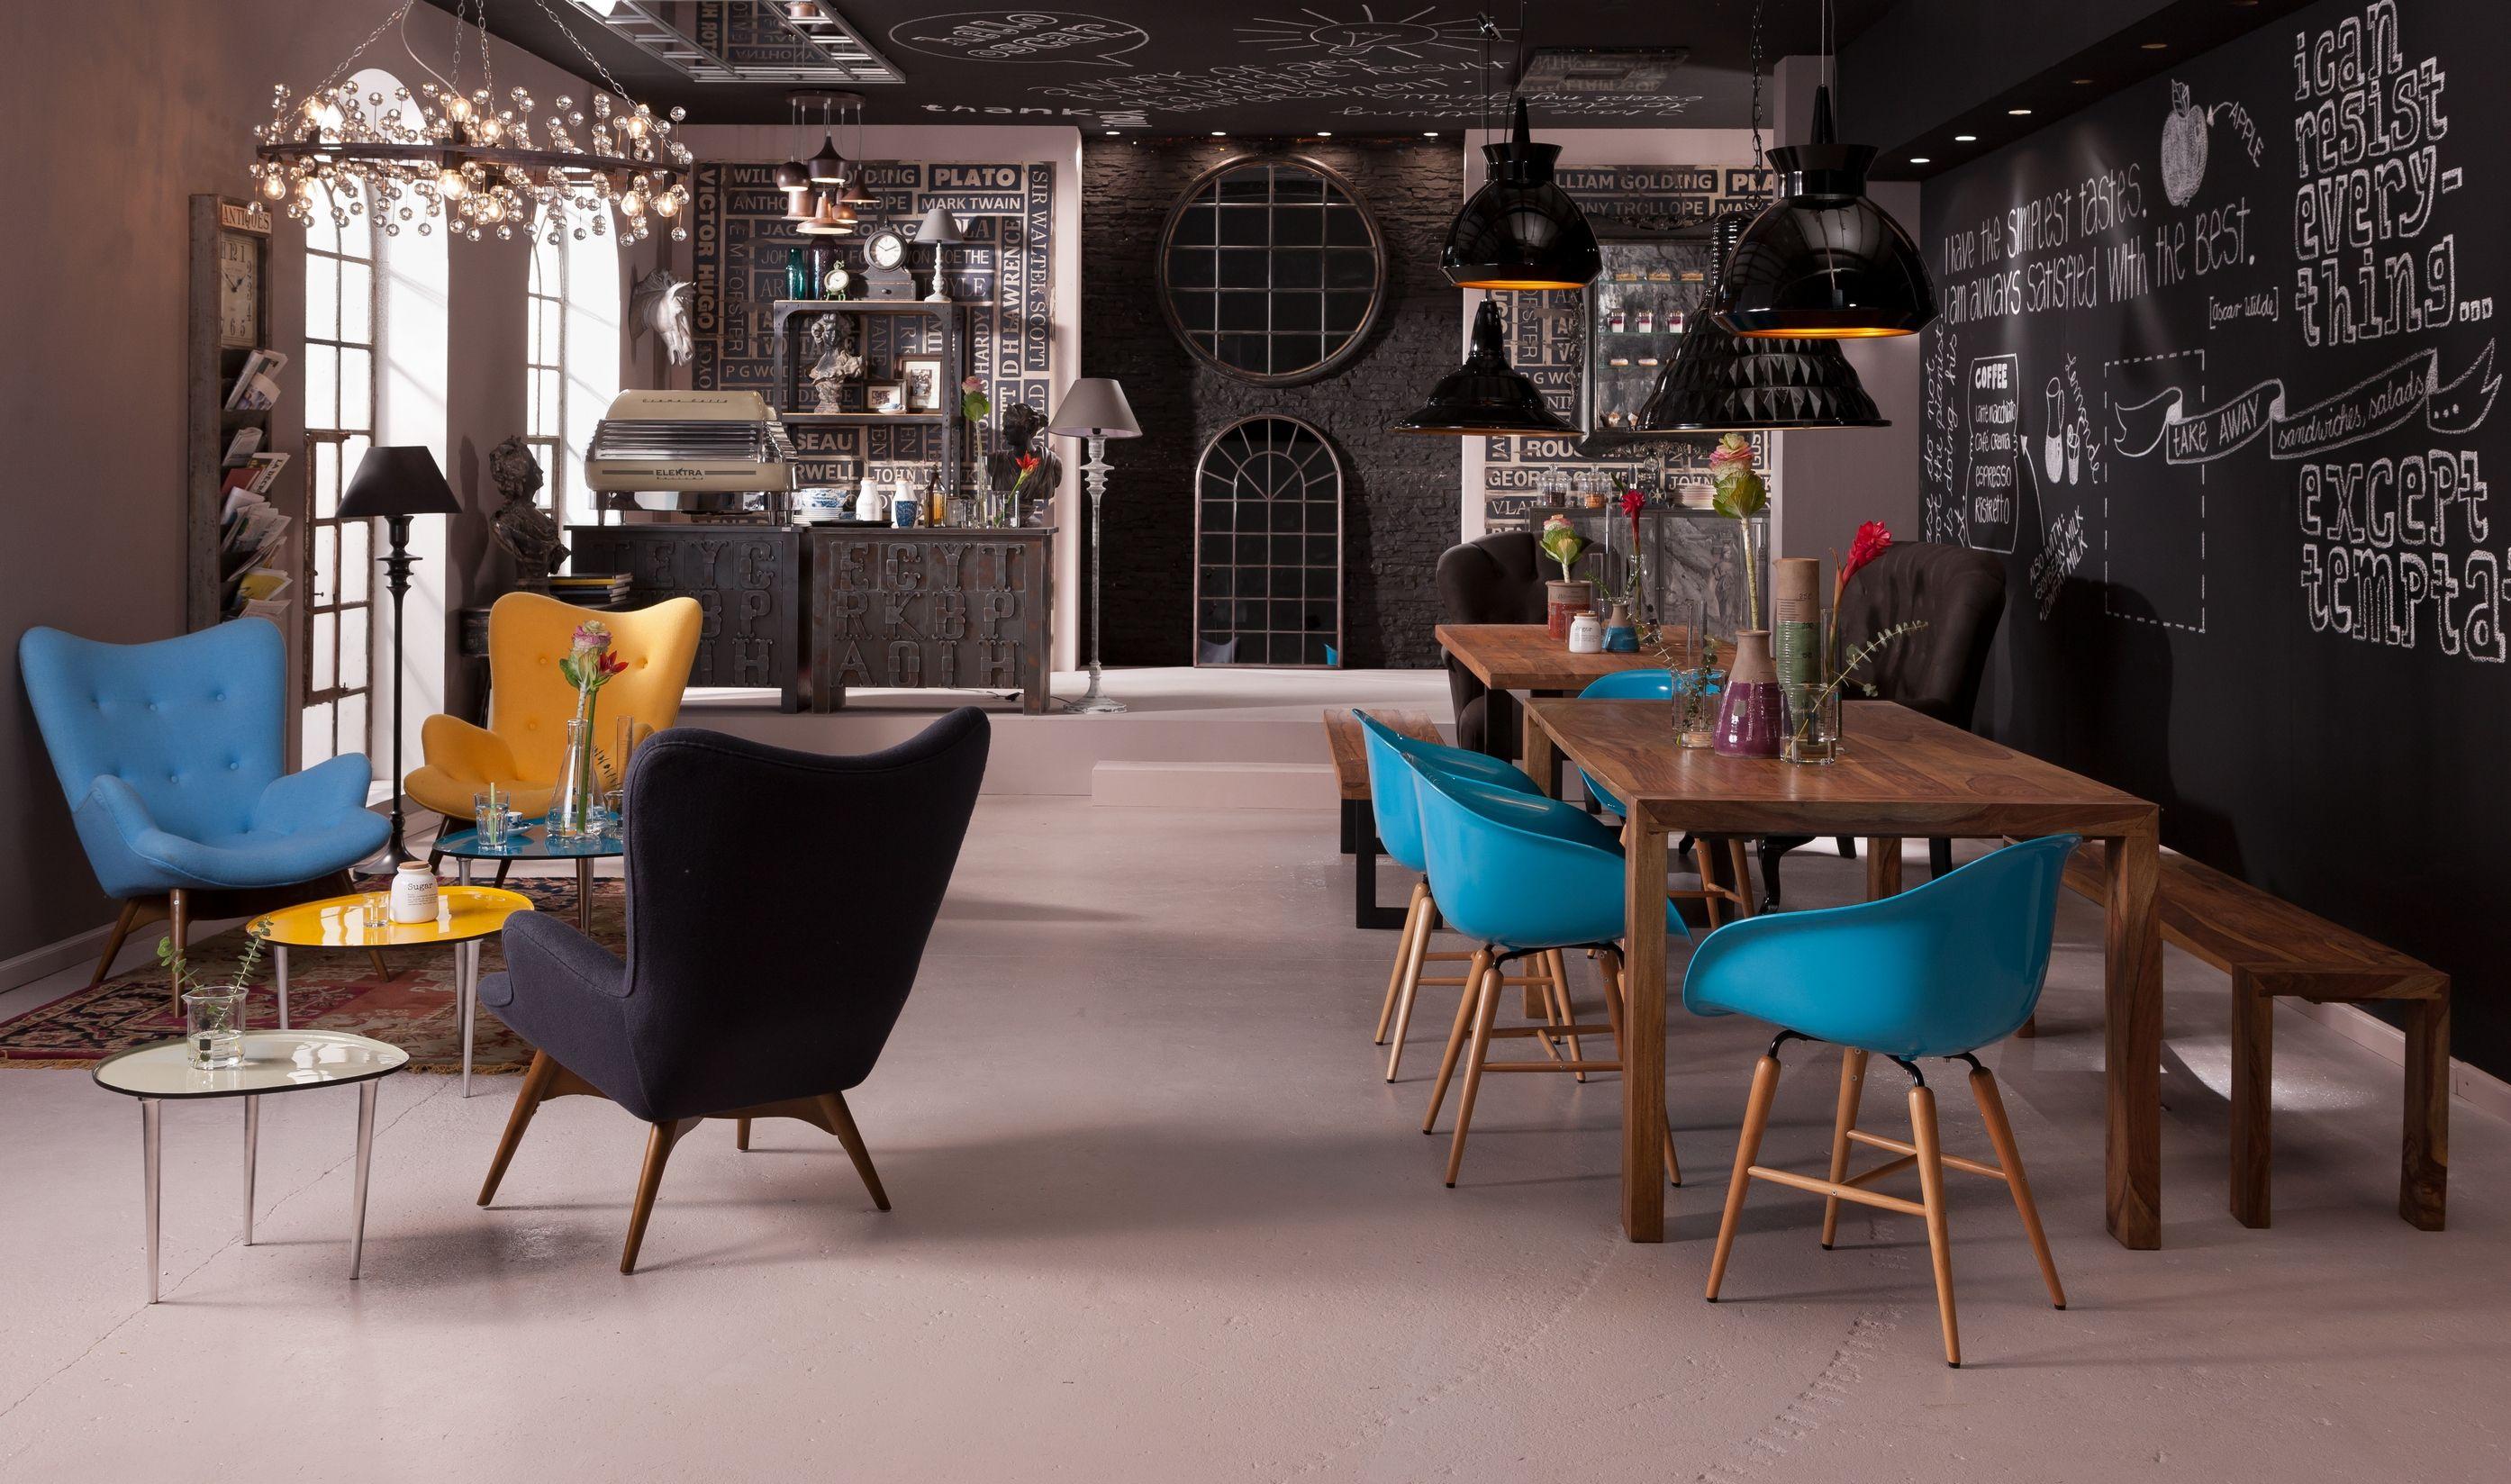 kare ambijenti kolekcija industrial loft kare cafe namestaj rasveta dekor pinterest. Black Bedroom Furniture Sets. Home Design Ideas